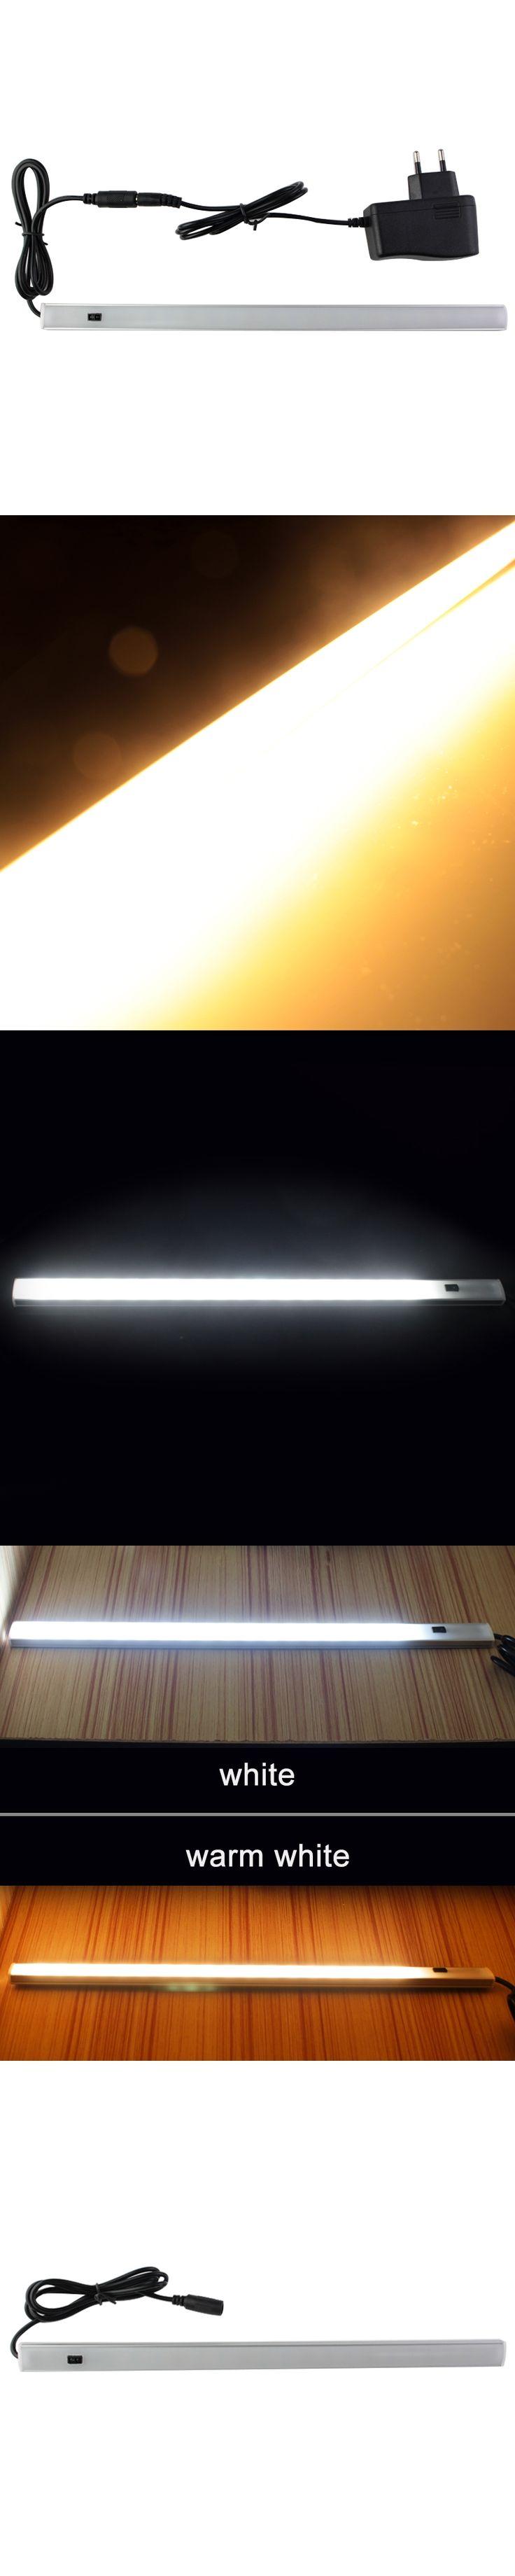 led closet light with PIR Motion Sensor  kitchen led under Cabinet light Night Light lamp DC 12V white/warm white with adapter